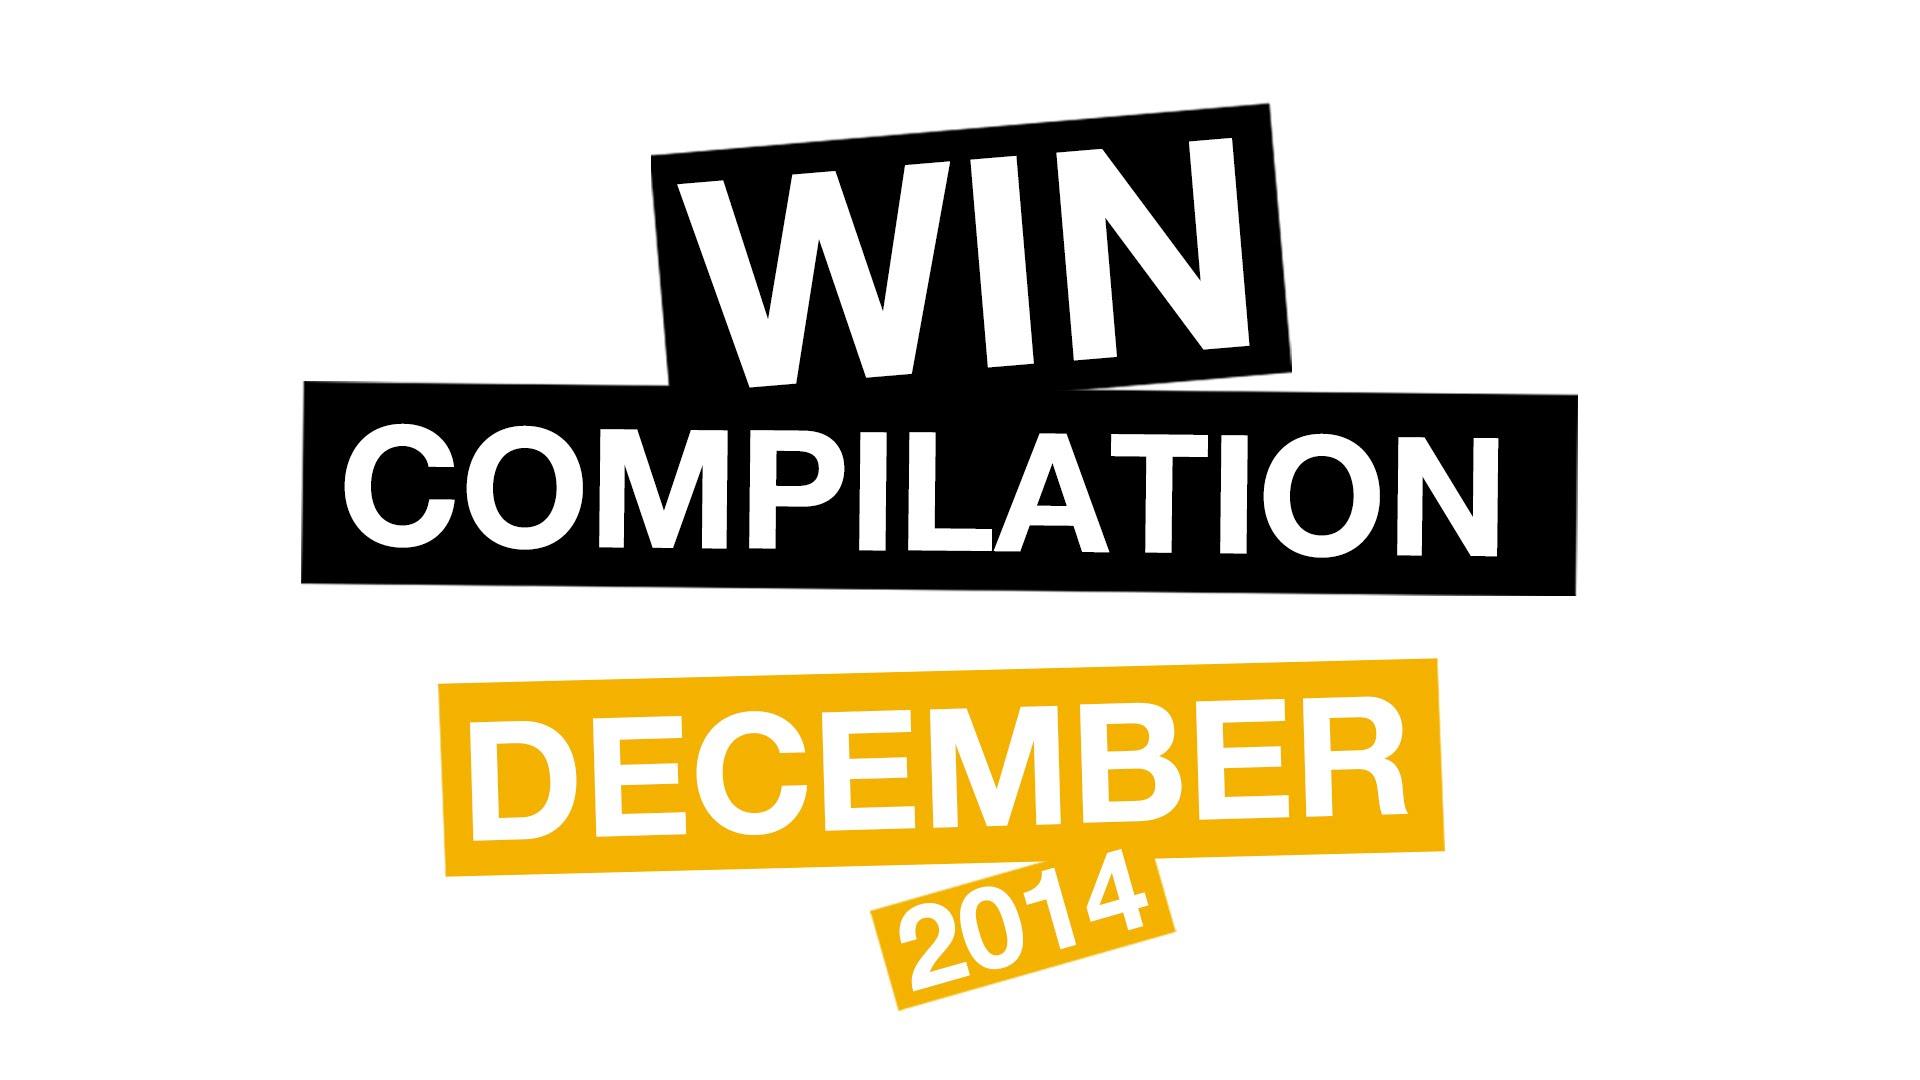 WIN Compilation December 2014